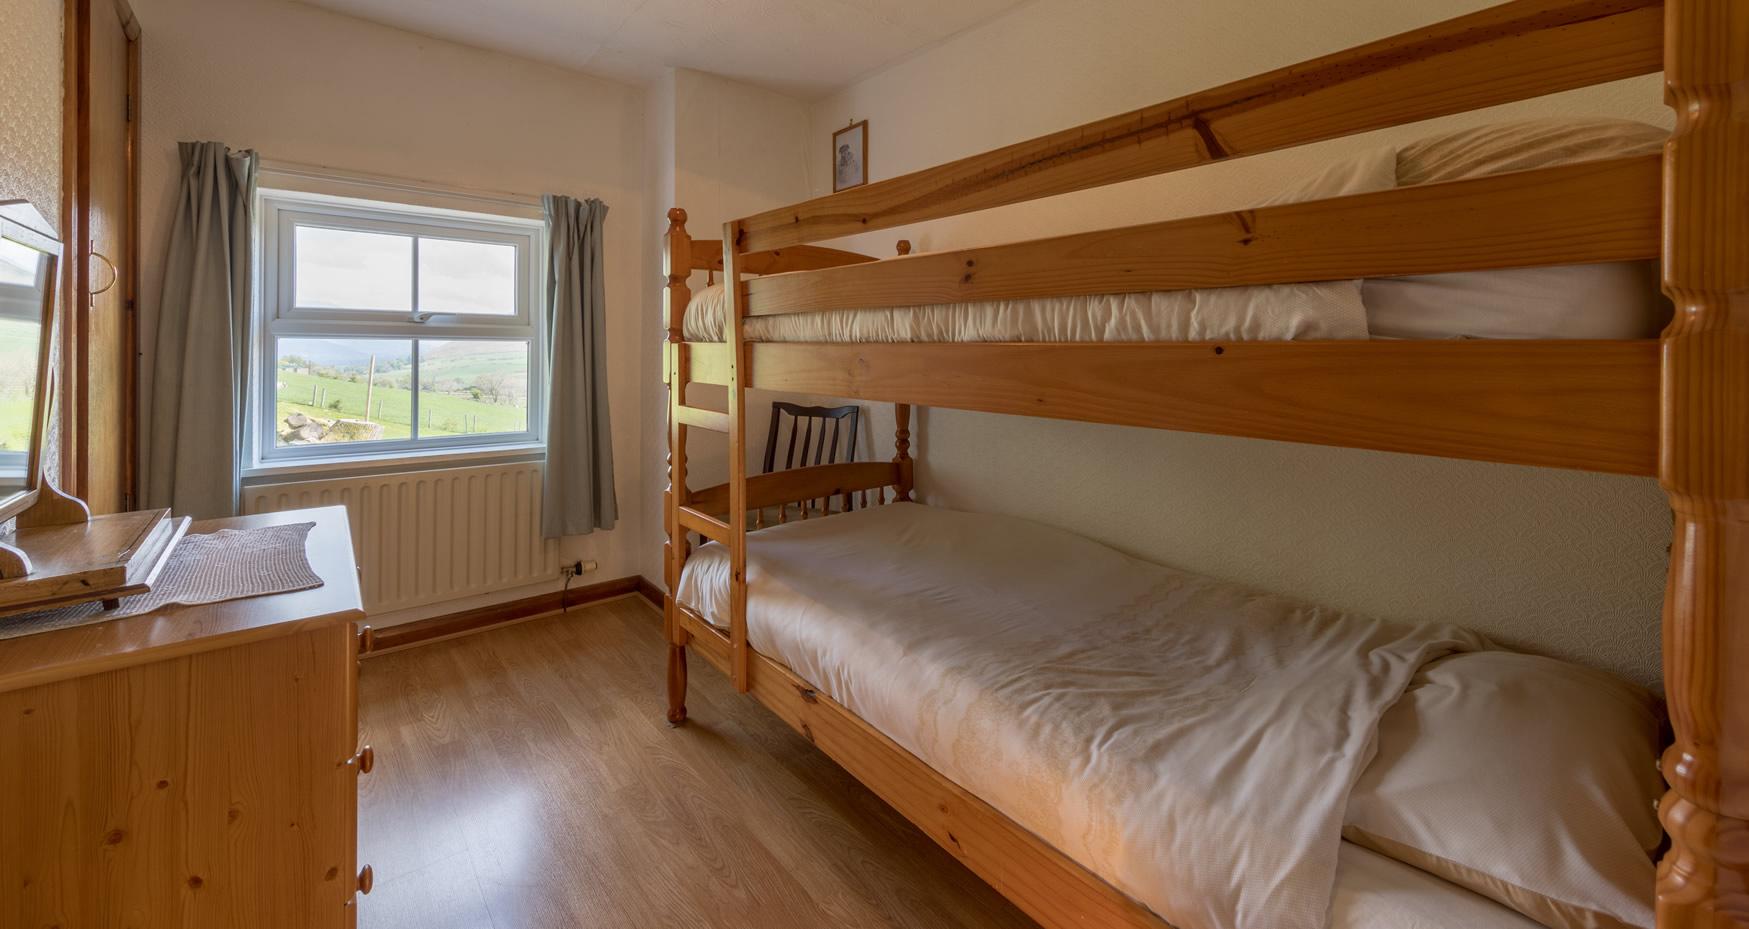 newlandscottage-bunkbeds